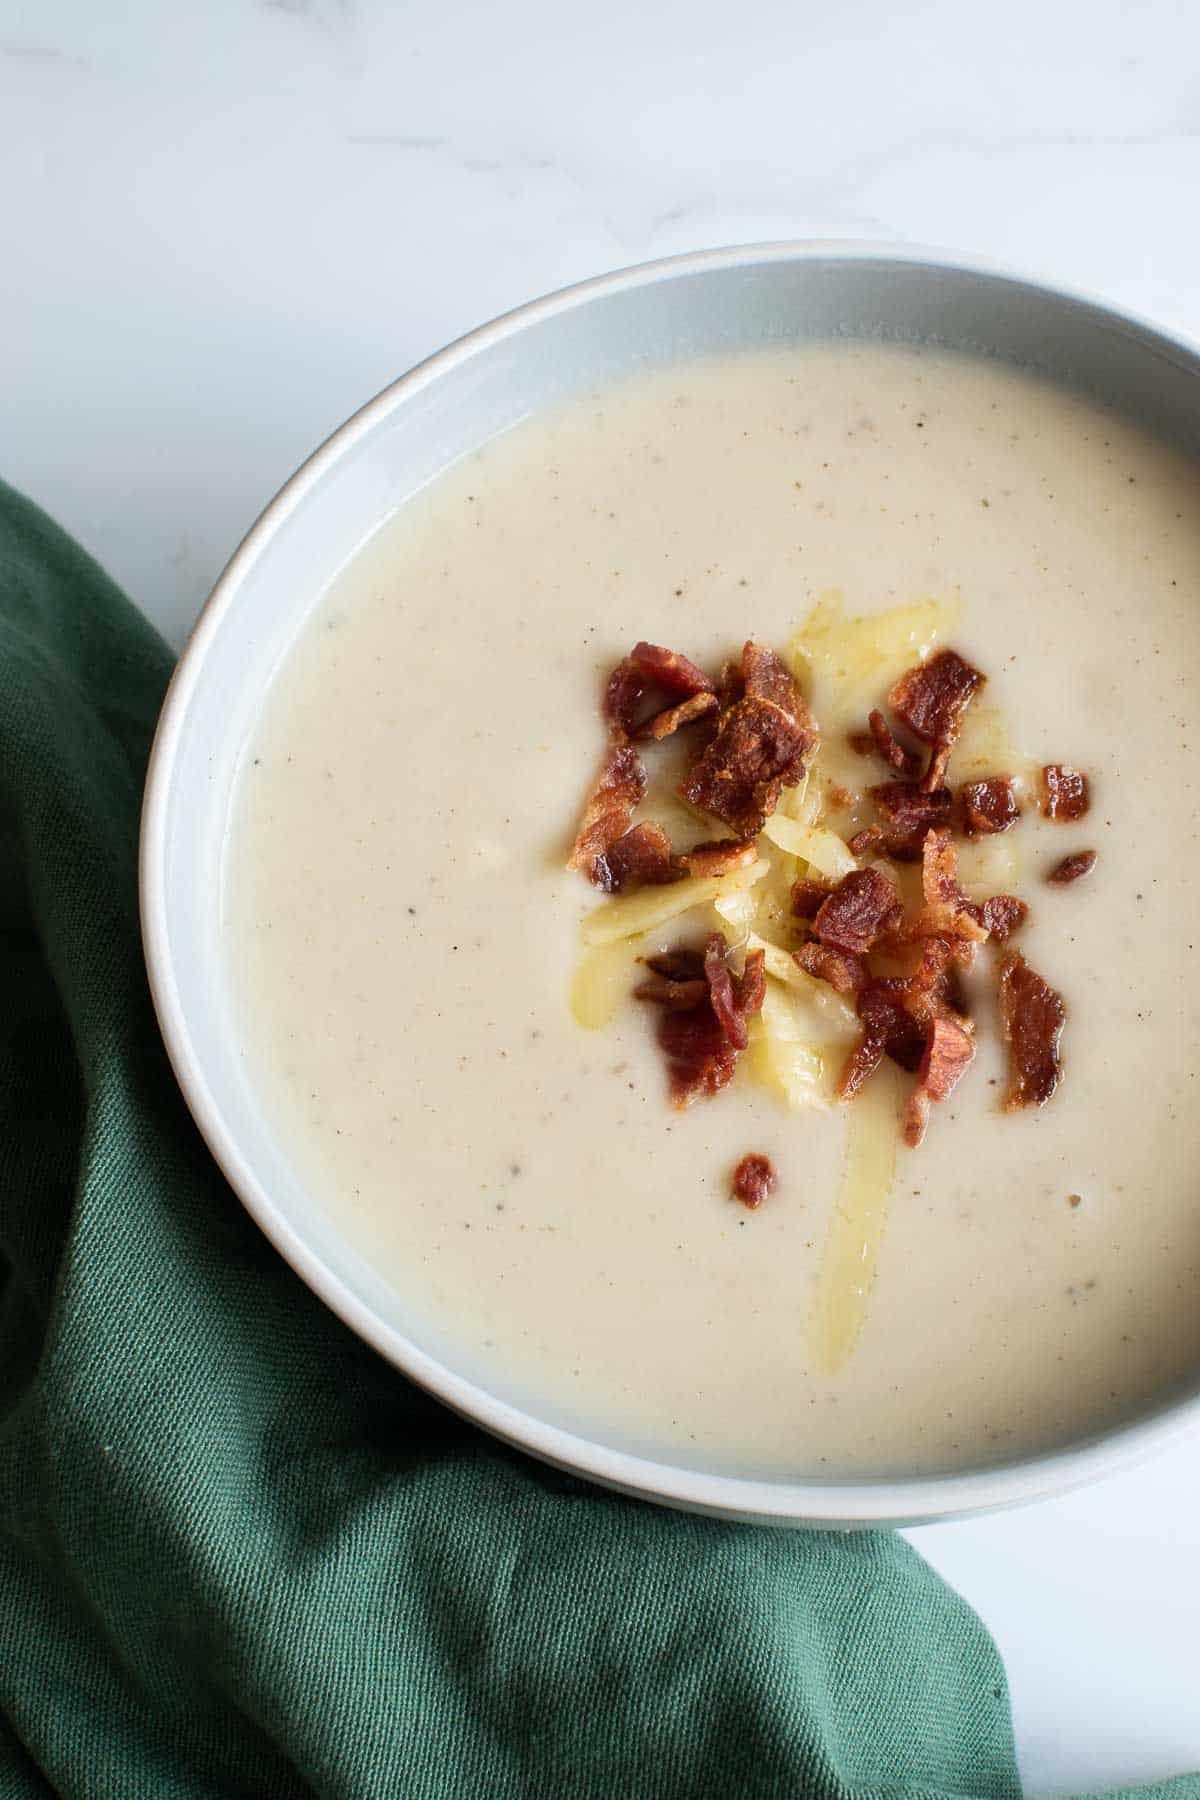 Creamy cauliflower soup with bacon bits.